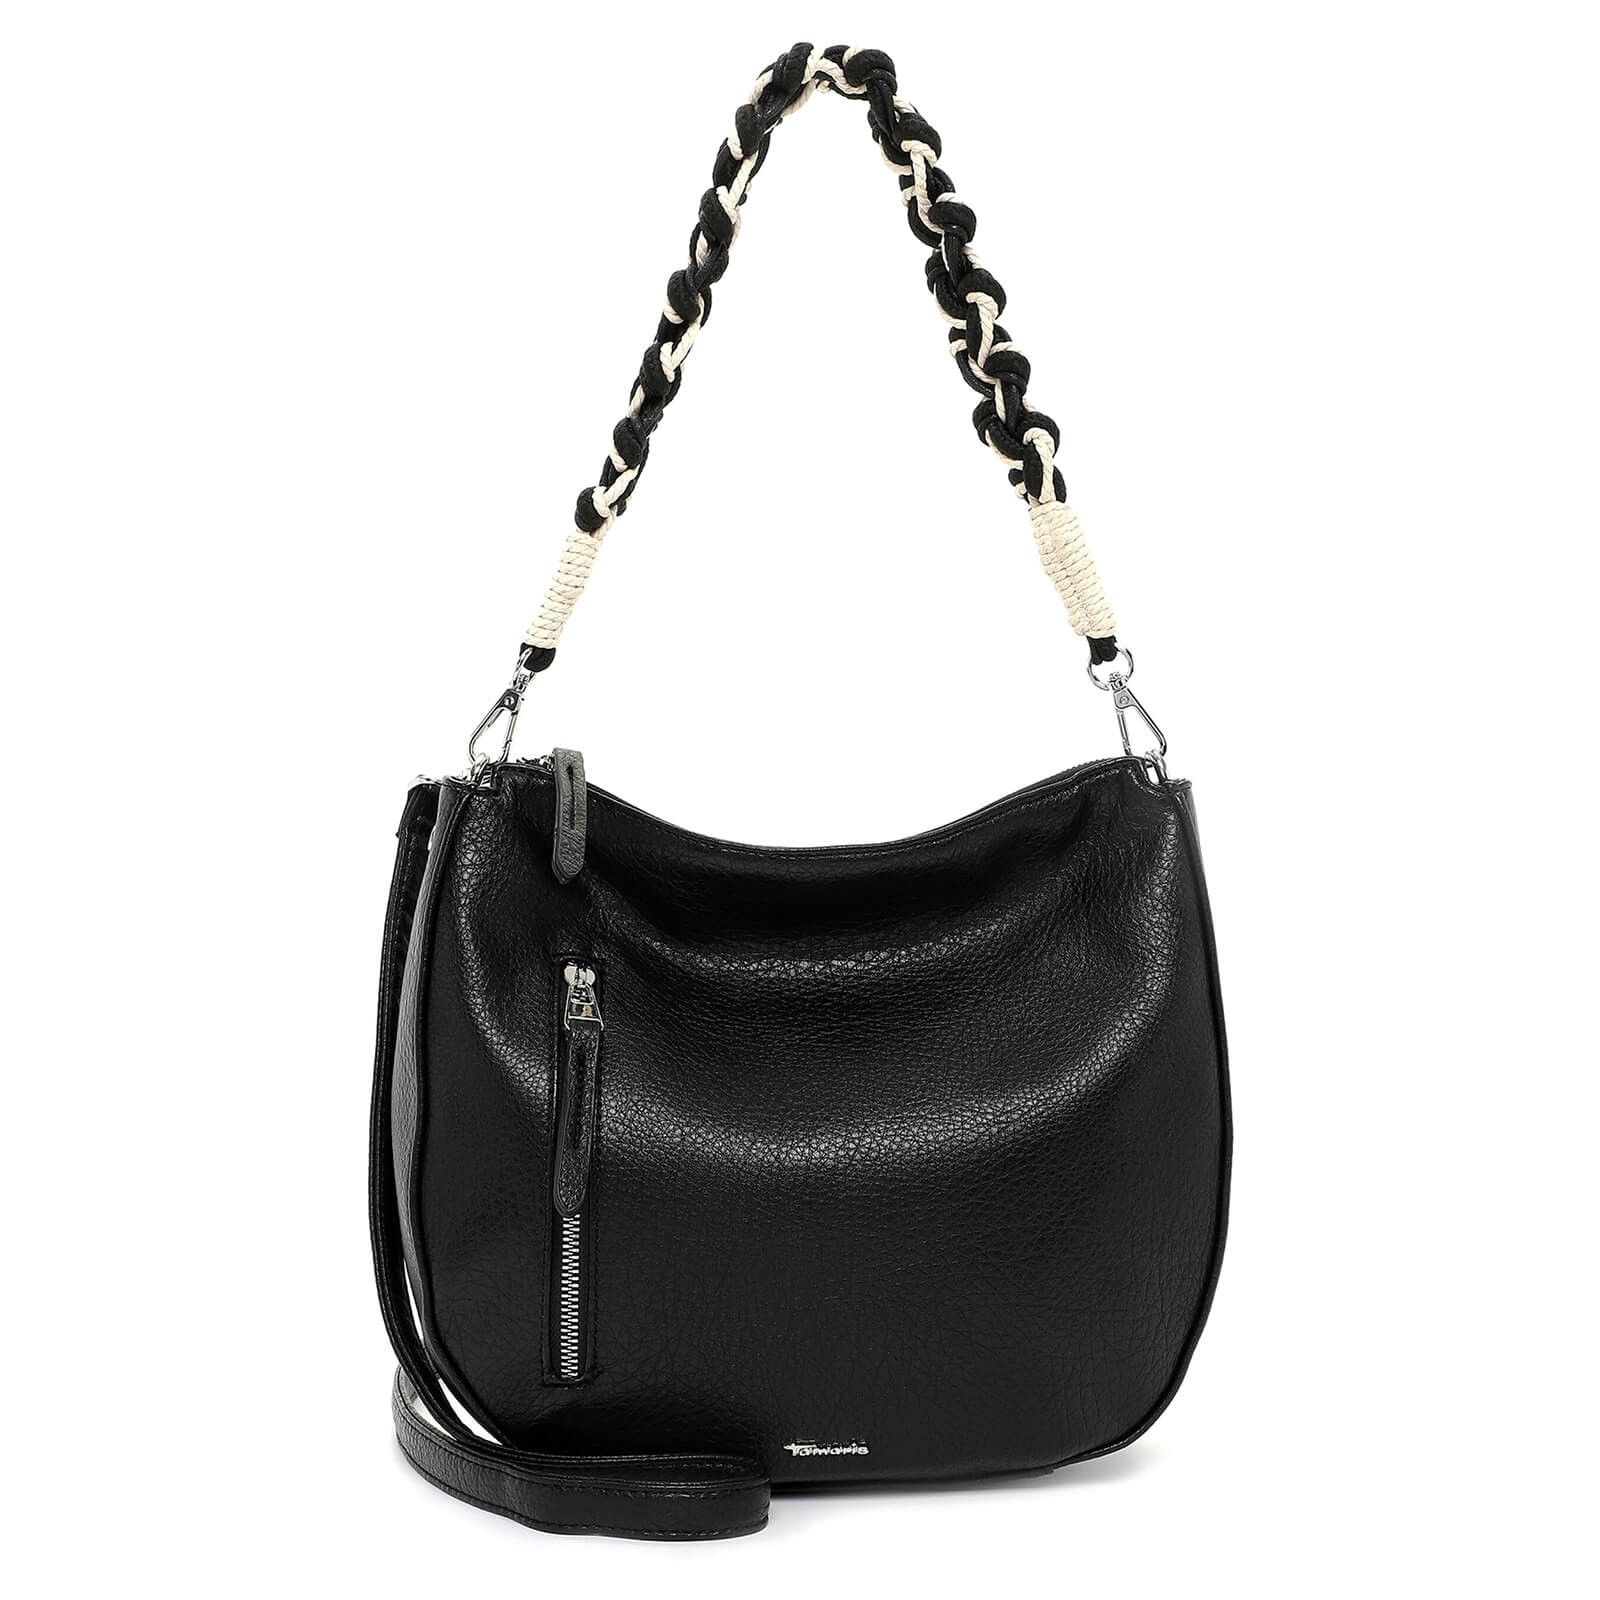 Dámska kabelka Tamaris Elken - čierna